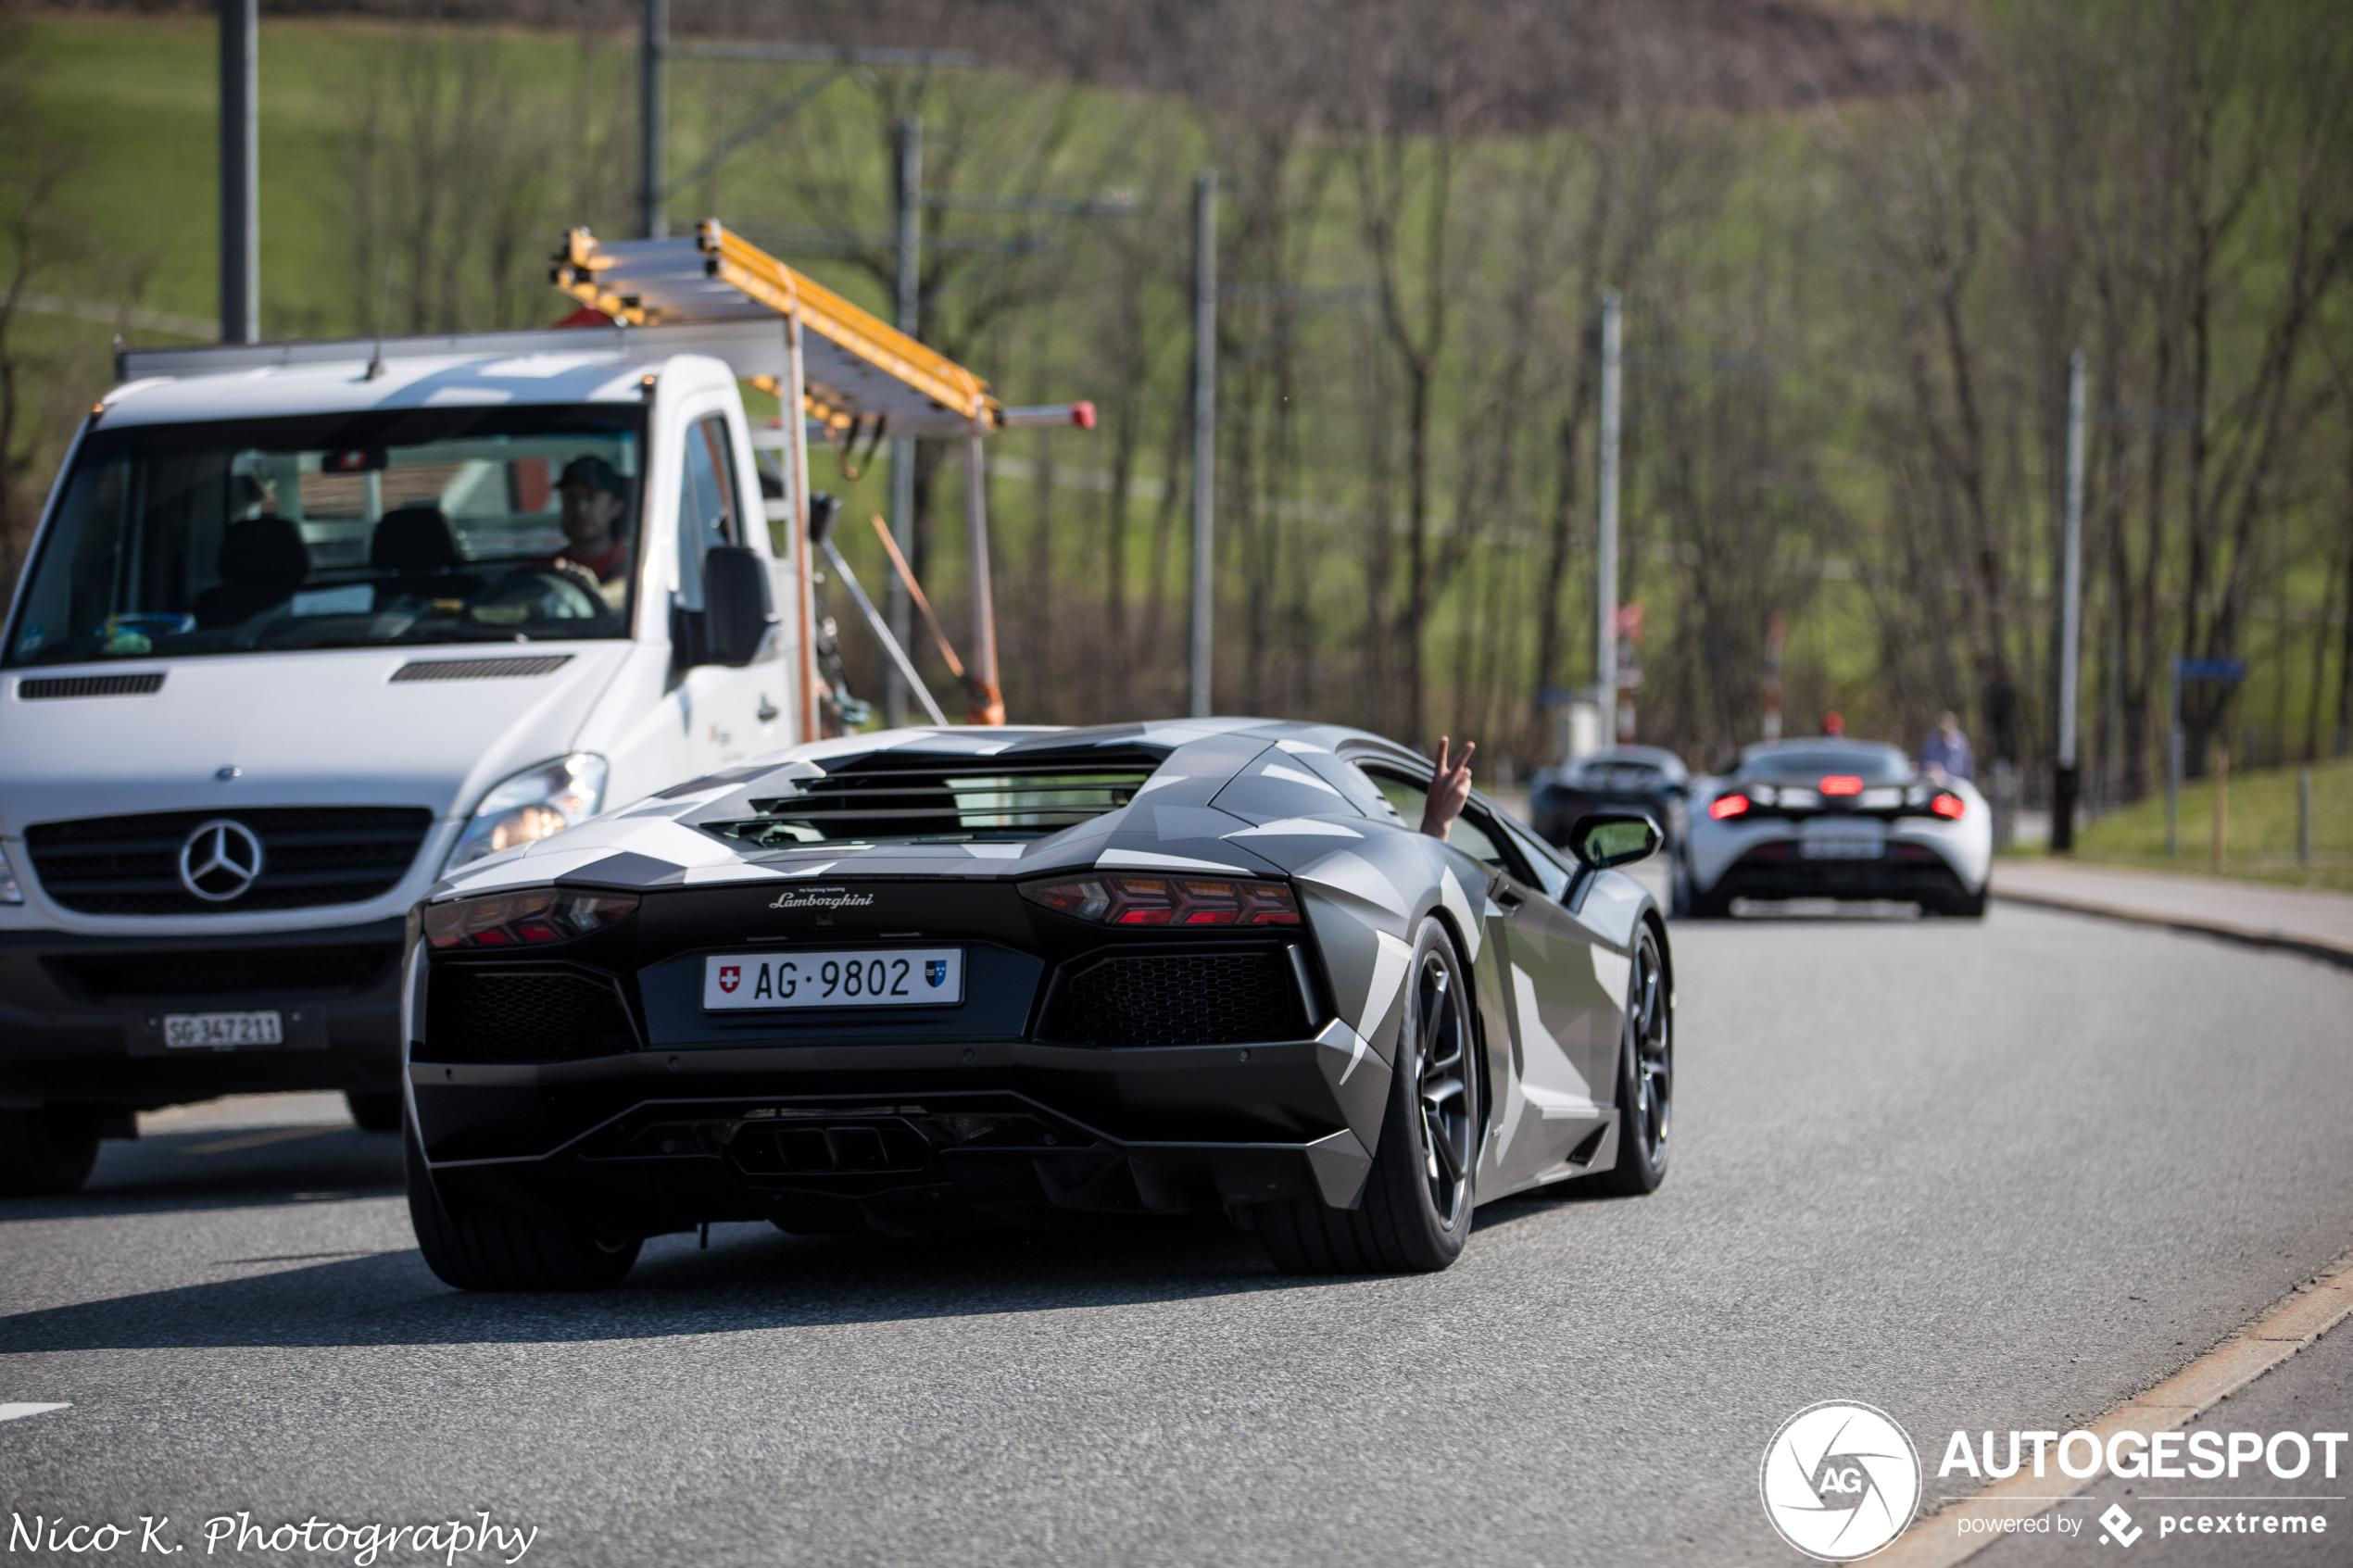 Lamborghini Aventador heeft een stoere wrap